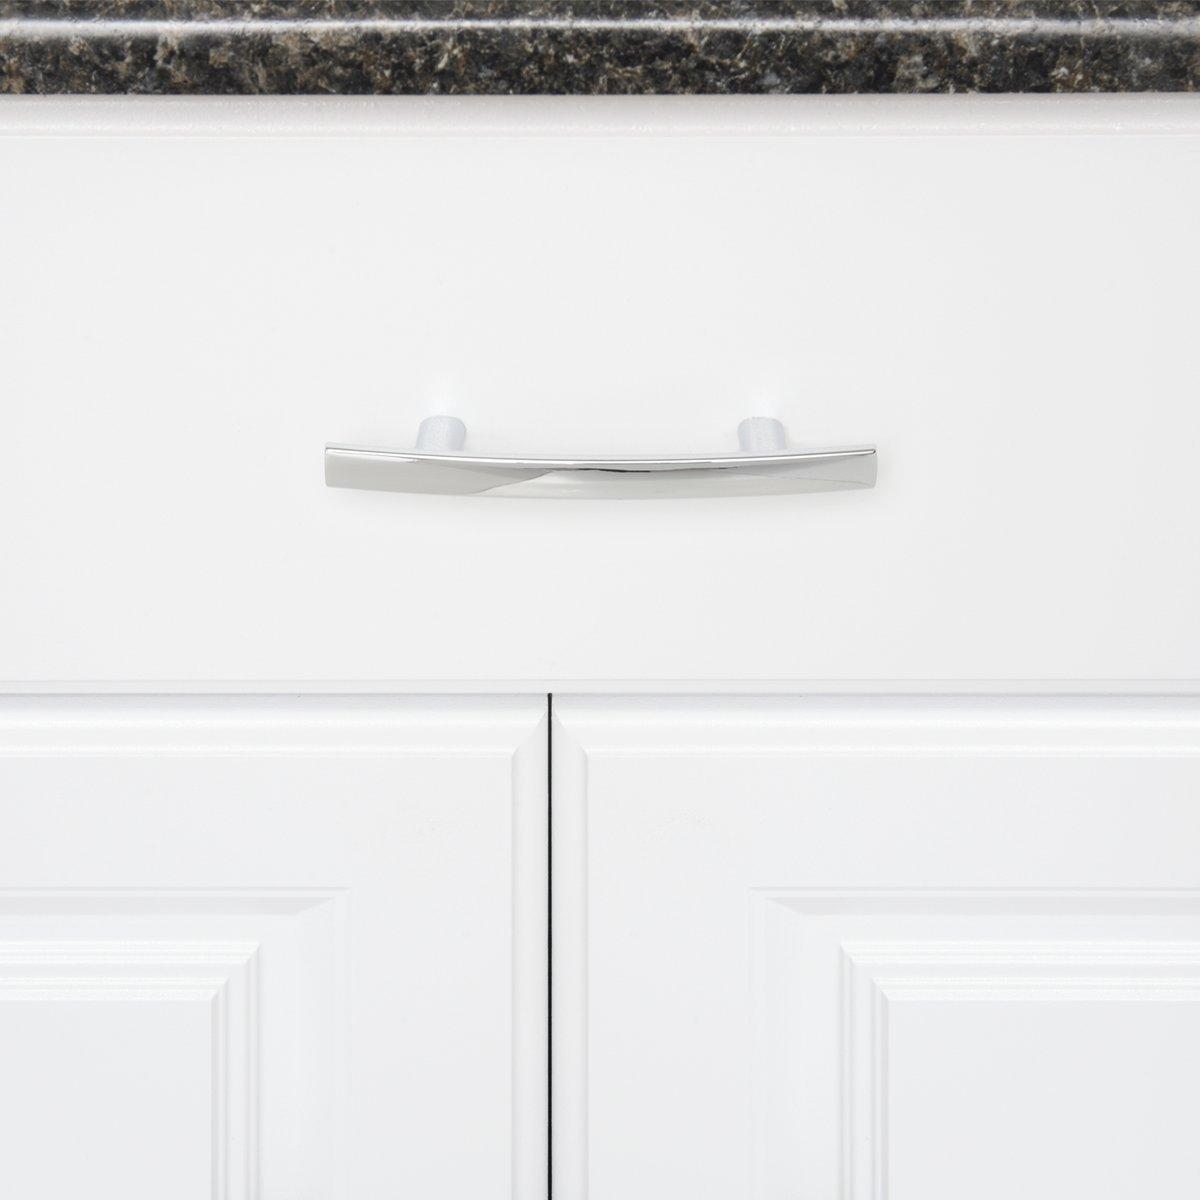 3 Hole Centre Satin Nickel 10-Pack 5.25 Length Basics Modern Curved Cabinet Handle